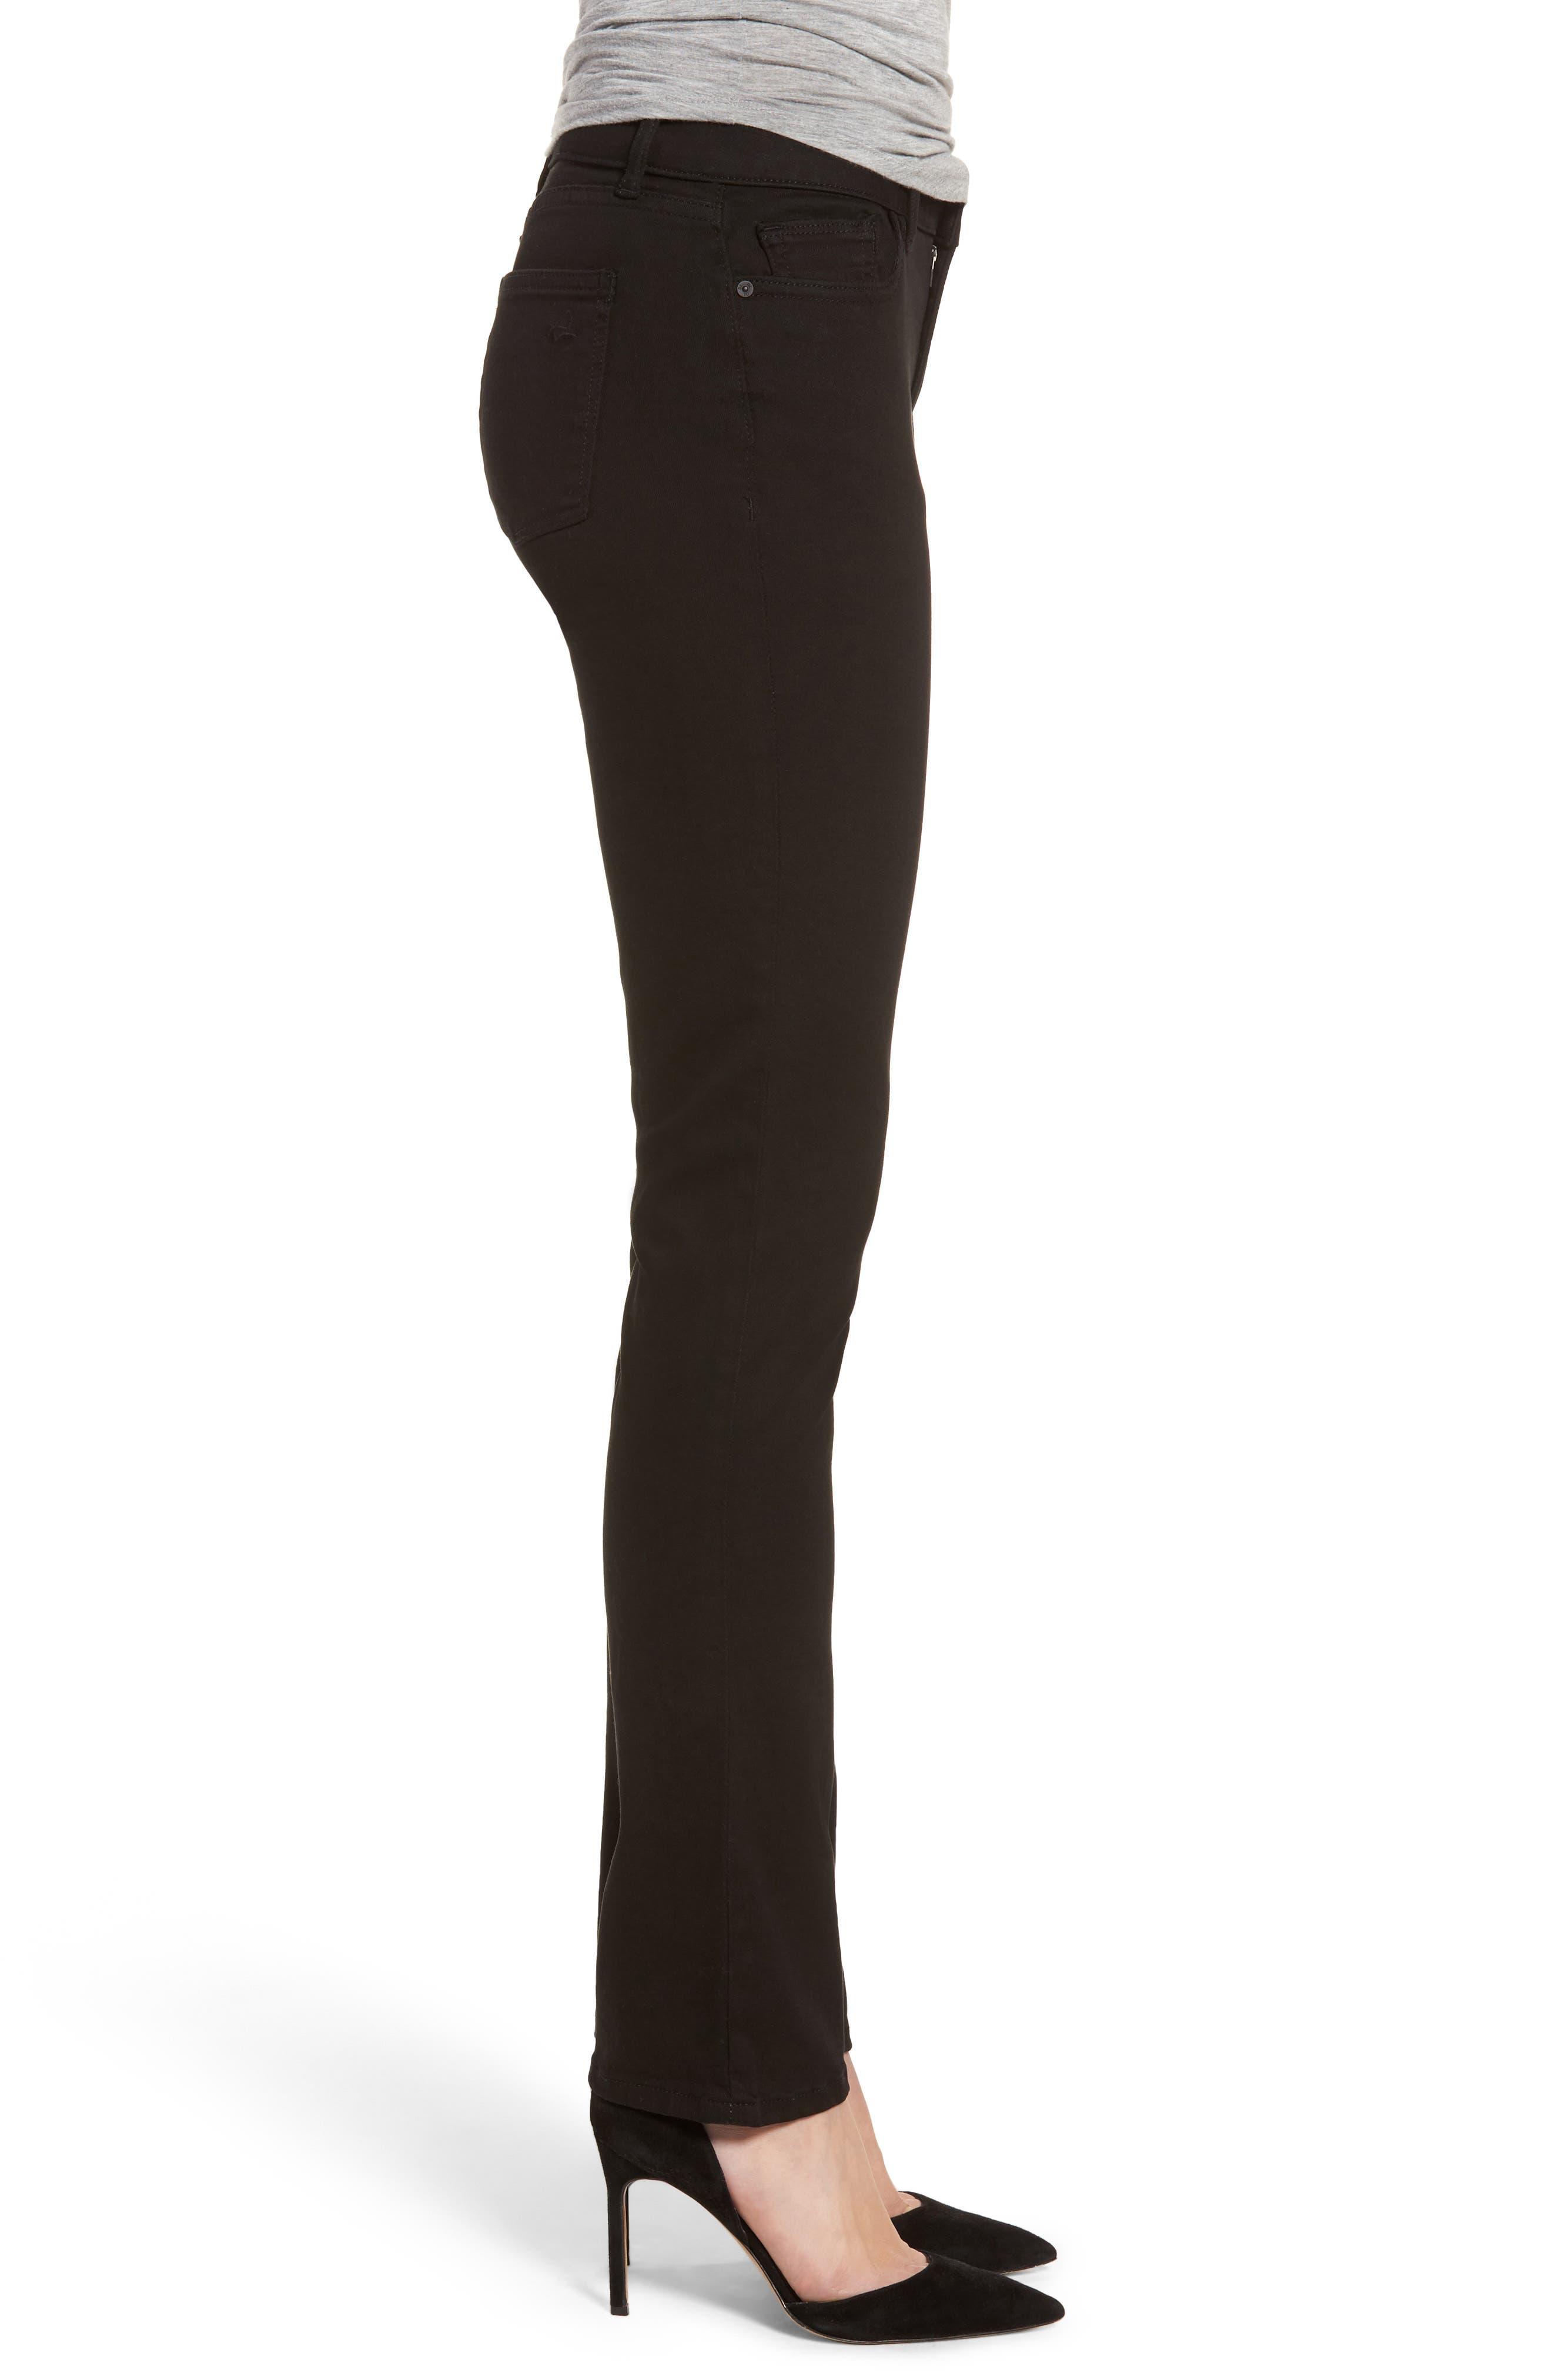 Coco Curvy Straight Leg Jeans,                             Alternate thumbnail 3, color,                             001